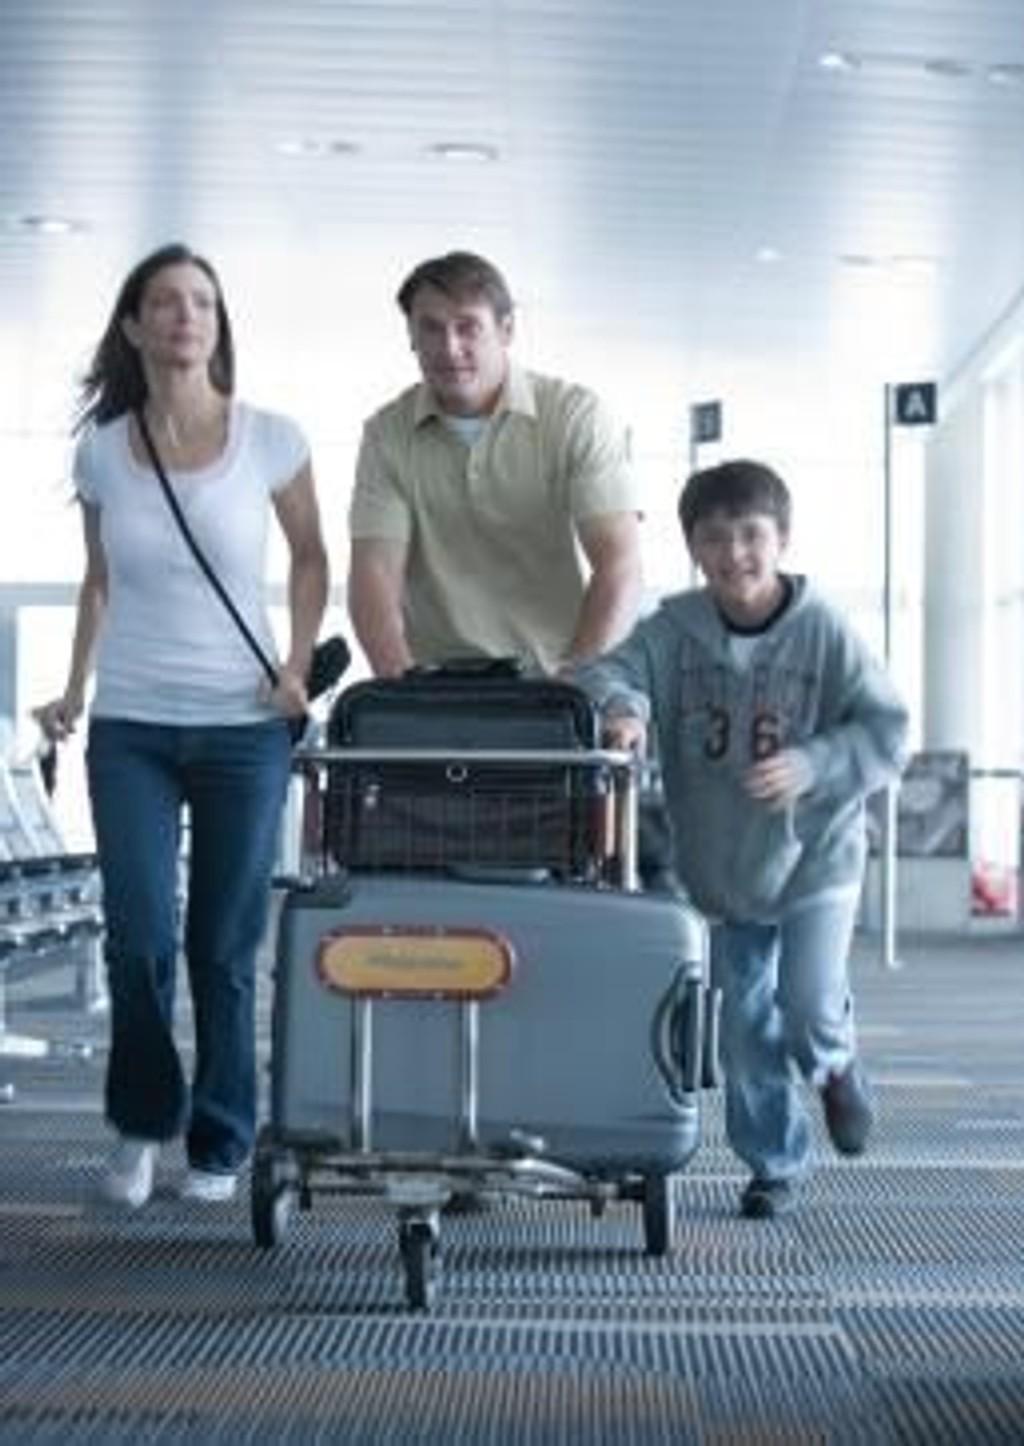 kvinnen med den tunge kofferten